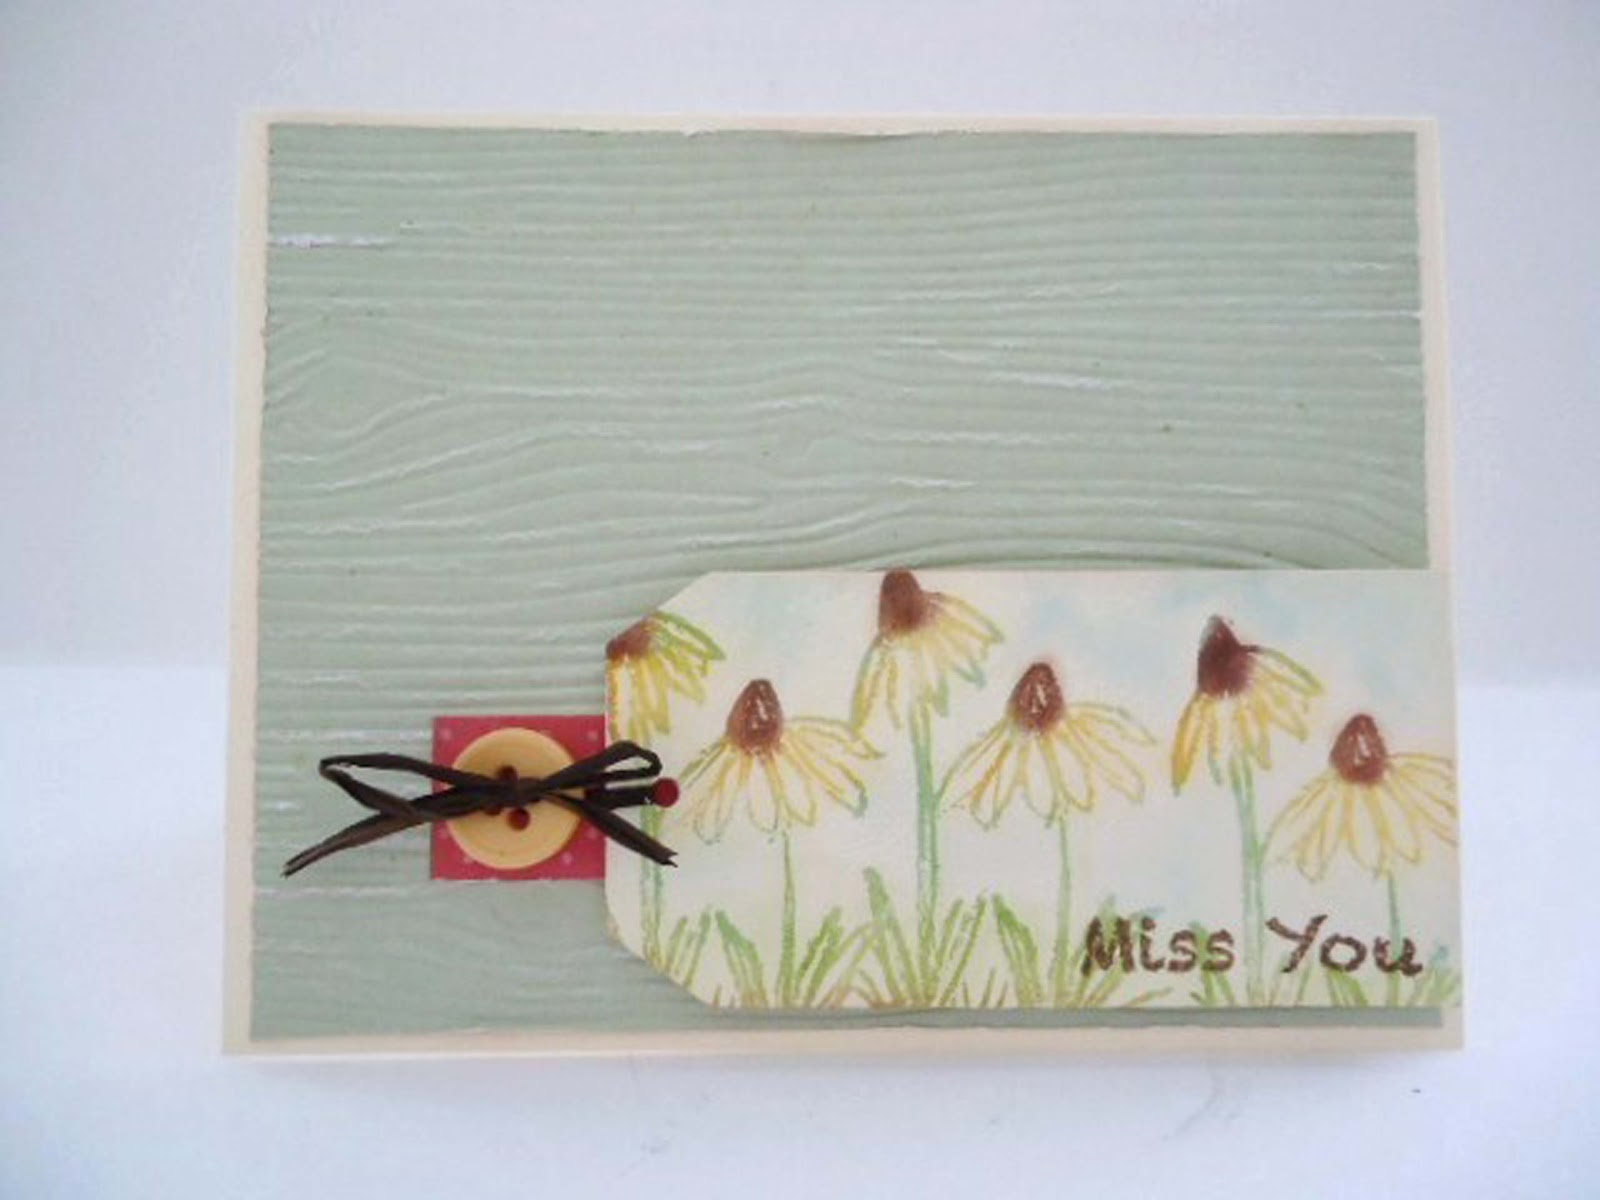 Kissin Krafts: Honey, I Miss You!